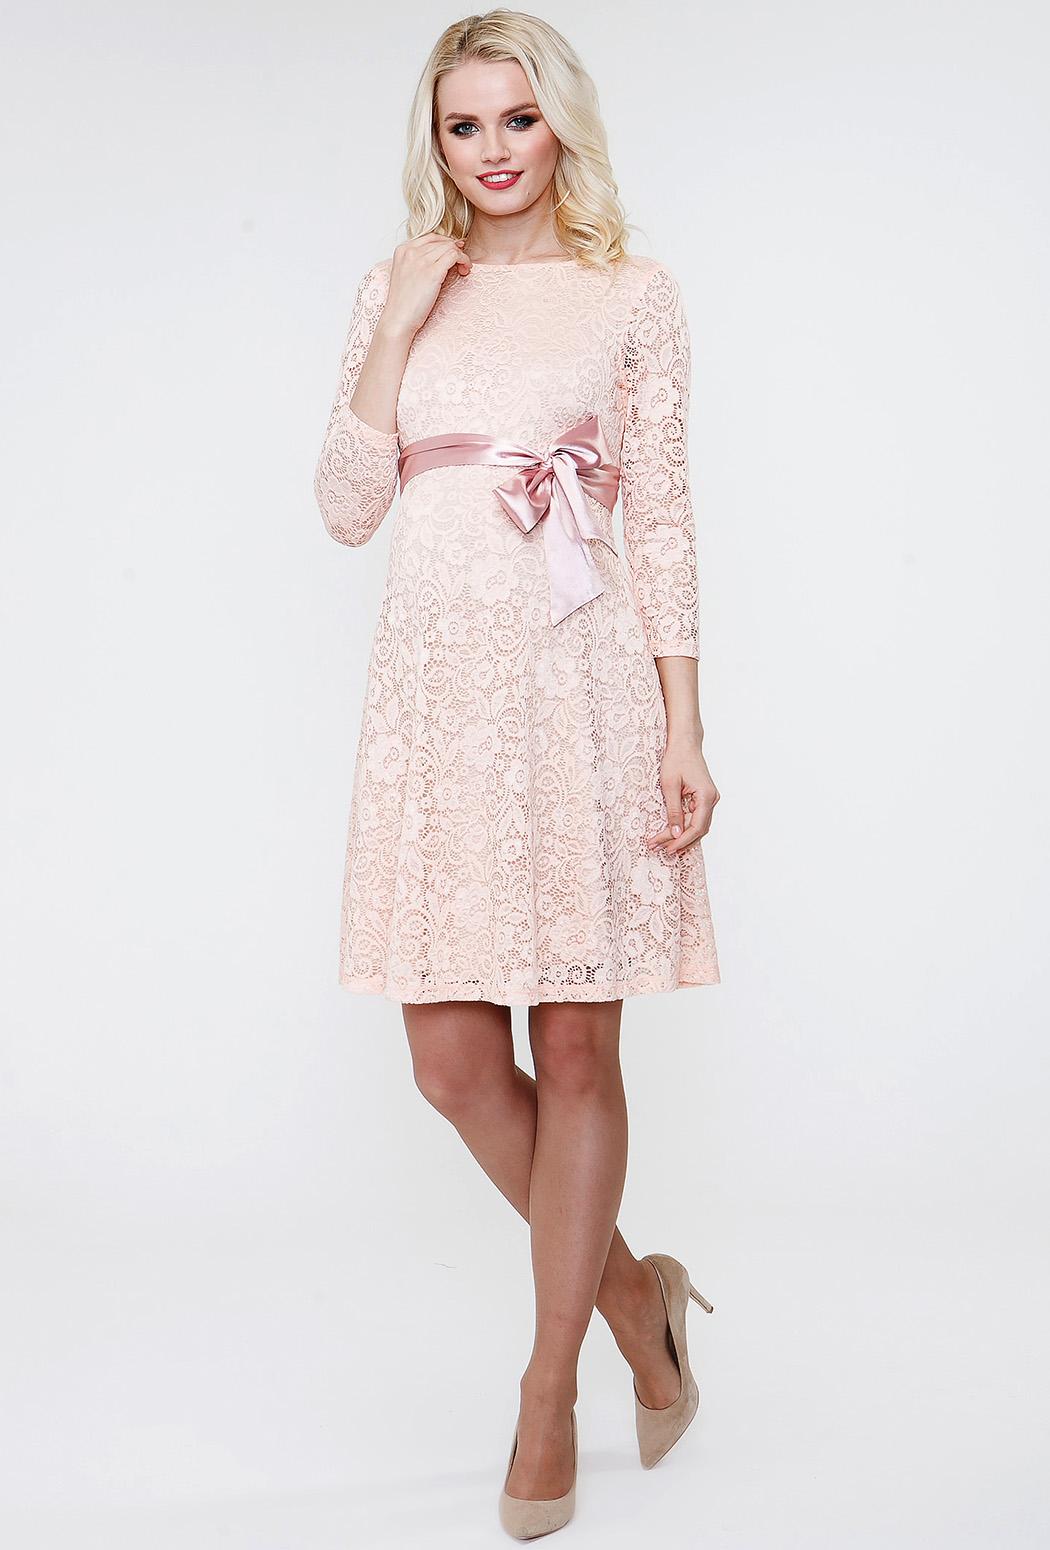 dc4bbe3cea3f728 Фото Платье Tutta Mama гипюр персик для беременных от магазина Kidster